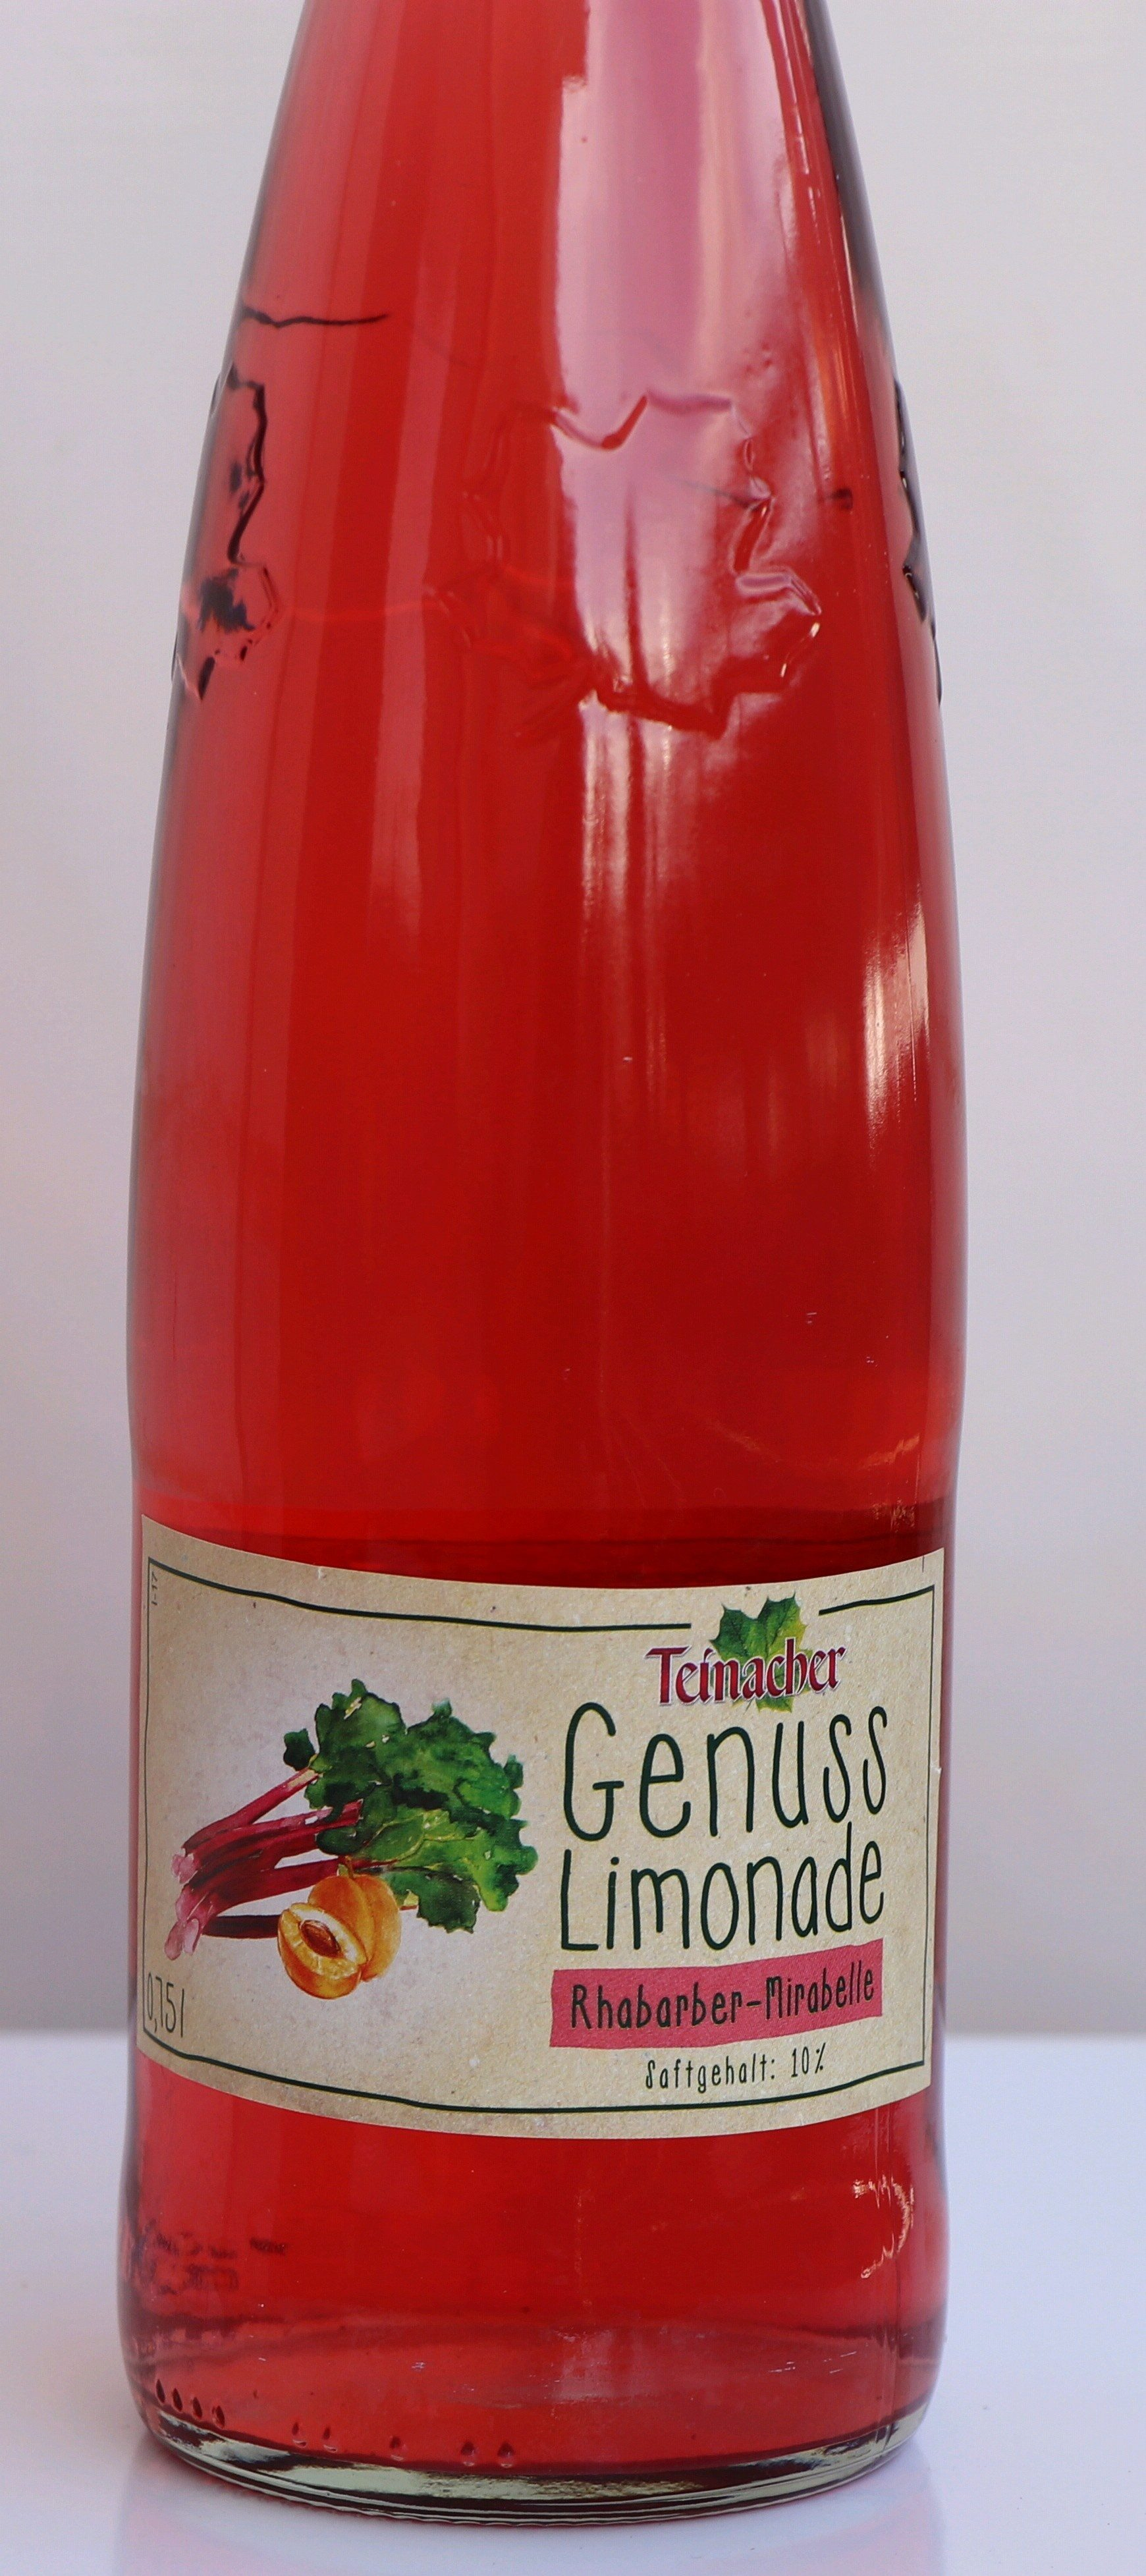 Teinacher - Genusslimonade - Produit